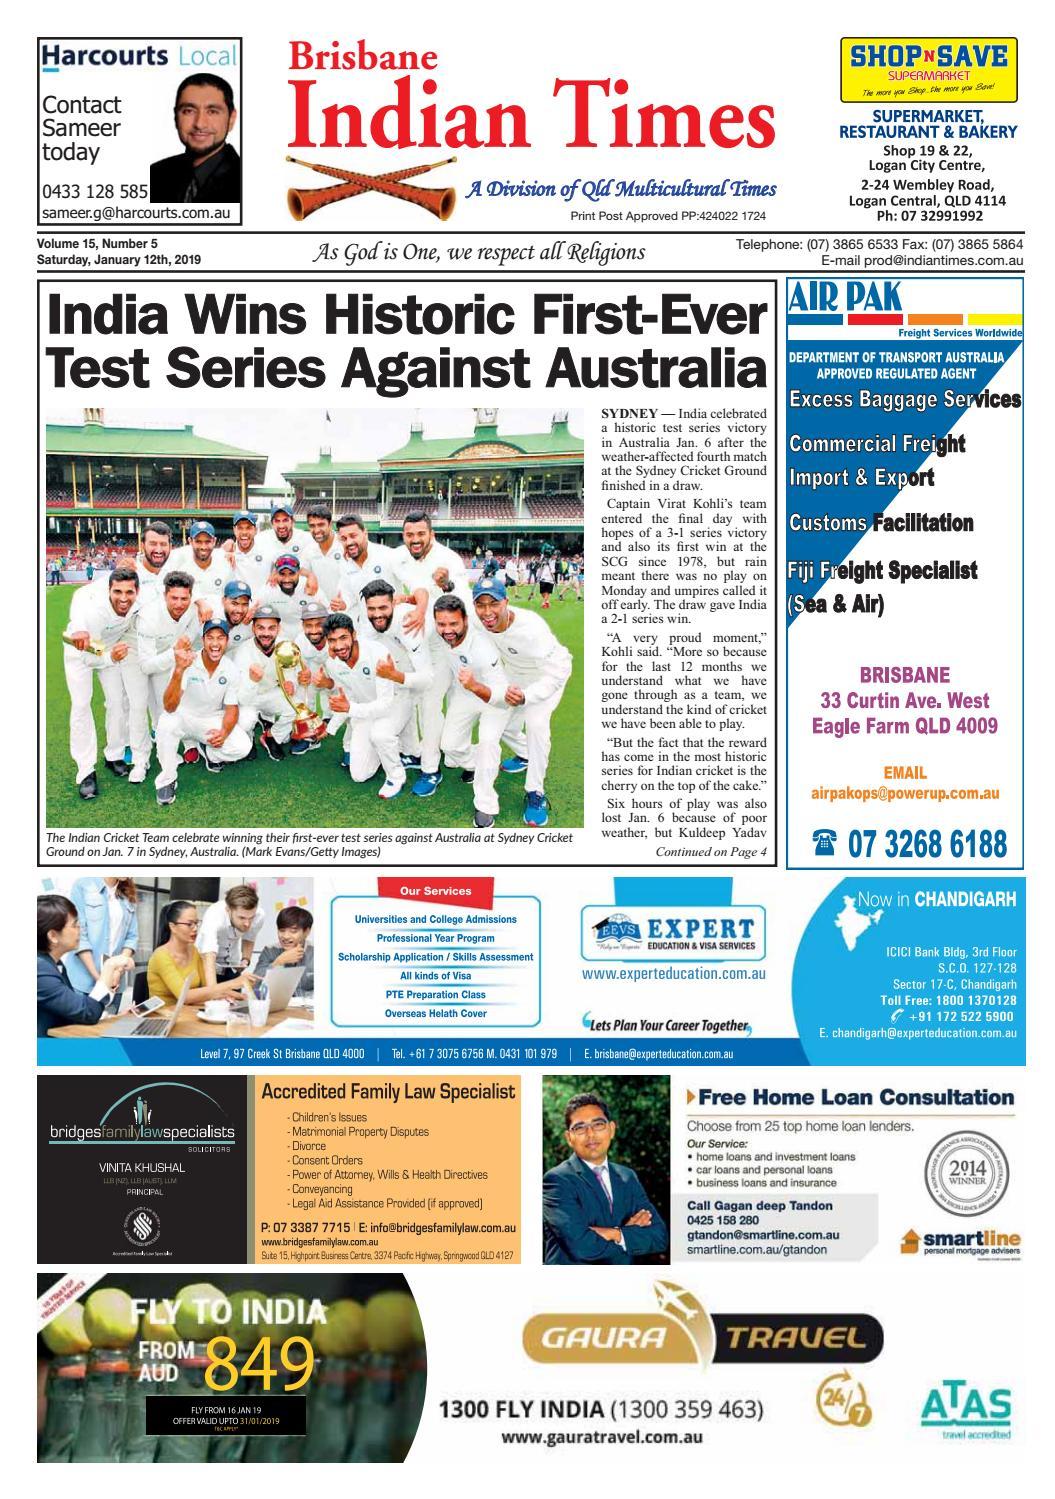 Brisbane Indian Times - January 2019 by Umesh Chandra - issuu